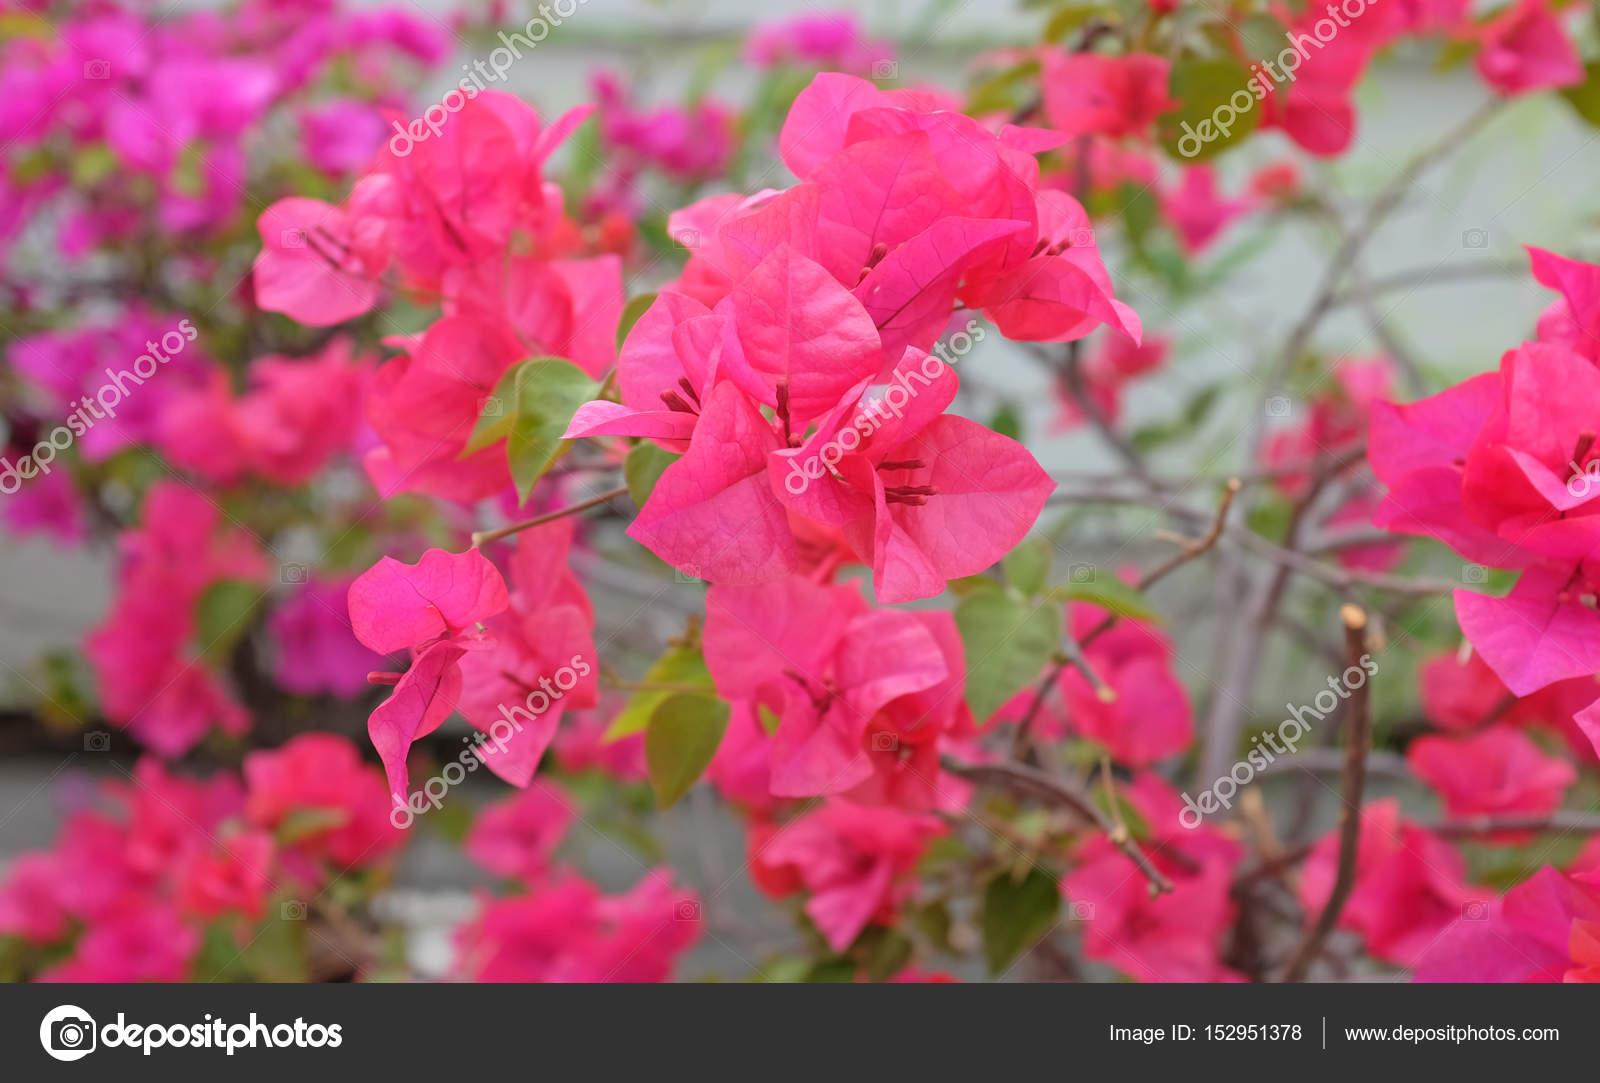 Bougainvillea Paper Flower In Pink Color Against Blur Garden Stock